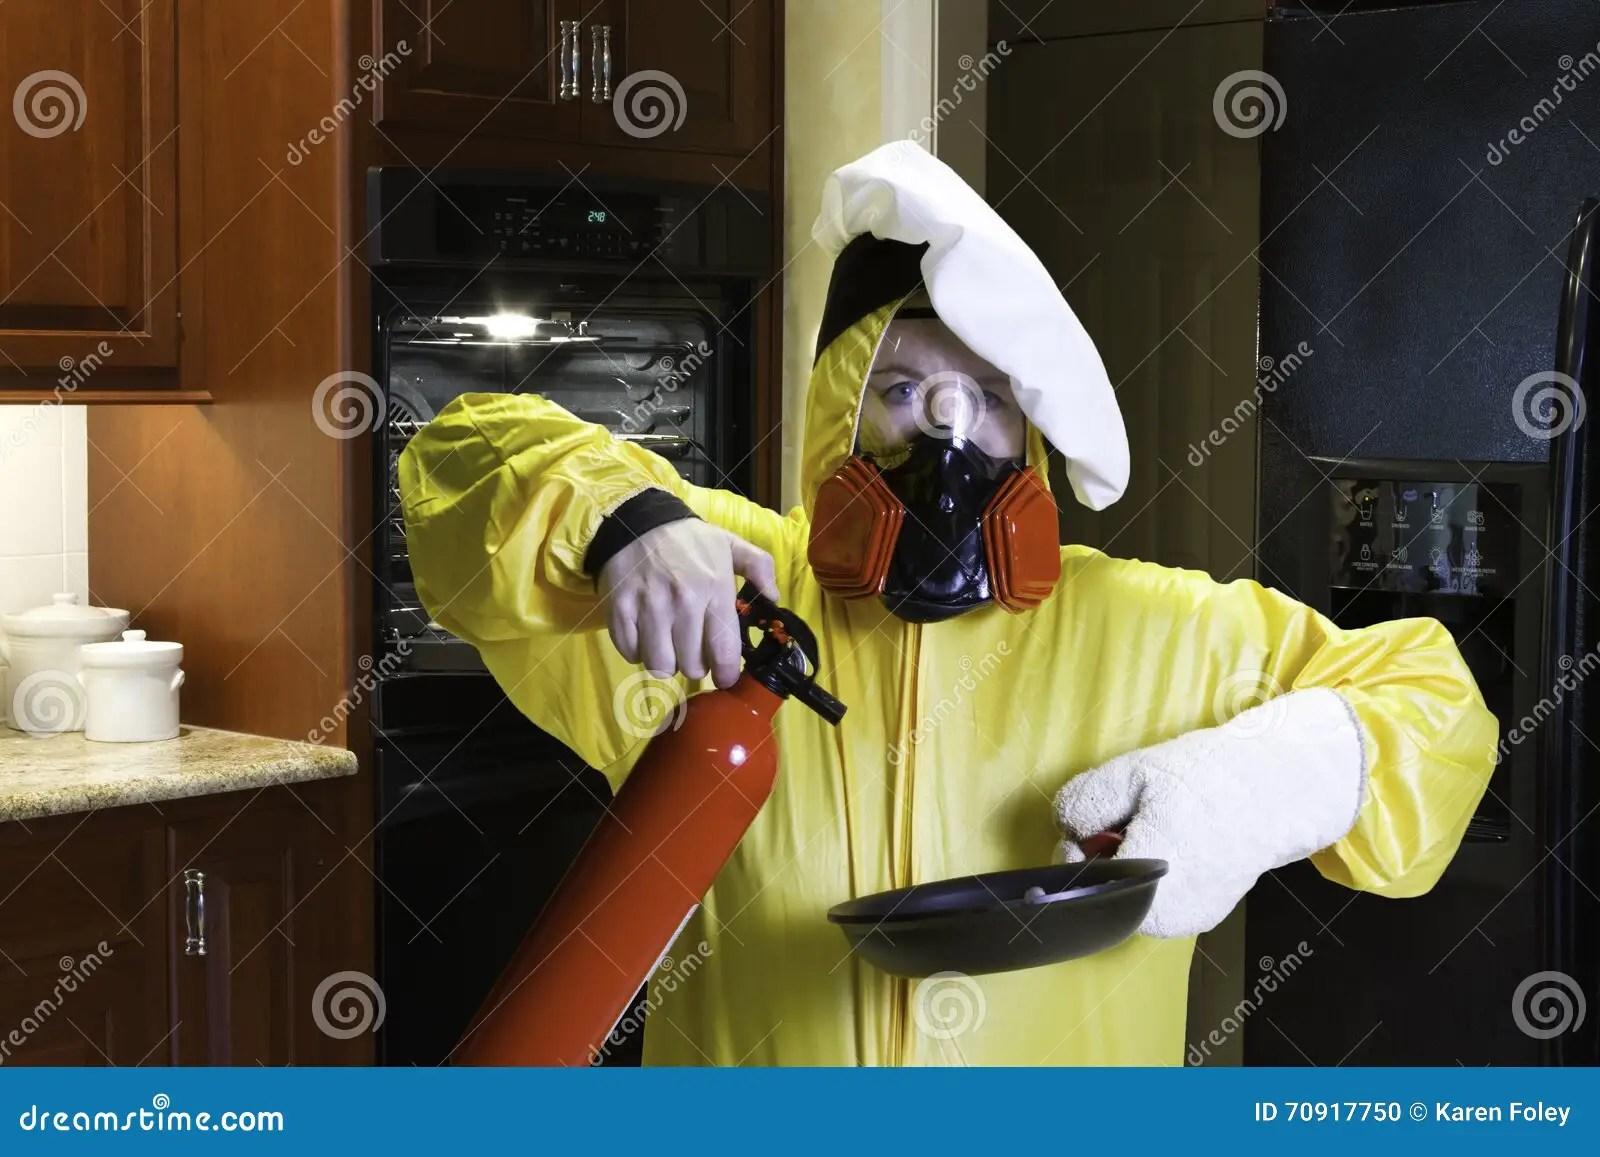 kitchen ventilator overstock faucets 与hazmat和灭火器的厨房灾害库存照片 图片包括有成熟 帽子 妈妈 烹调 hazmat衣服的妇女和人工呼吸机佩带的厨师的帽子不采取行动灭火器和平底锅在厨房里